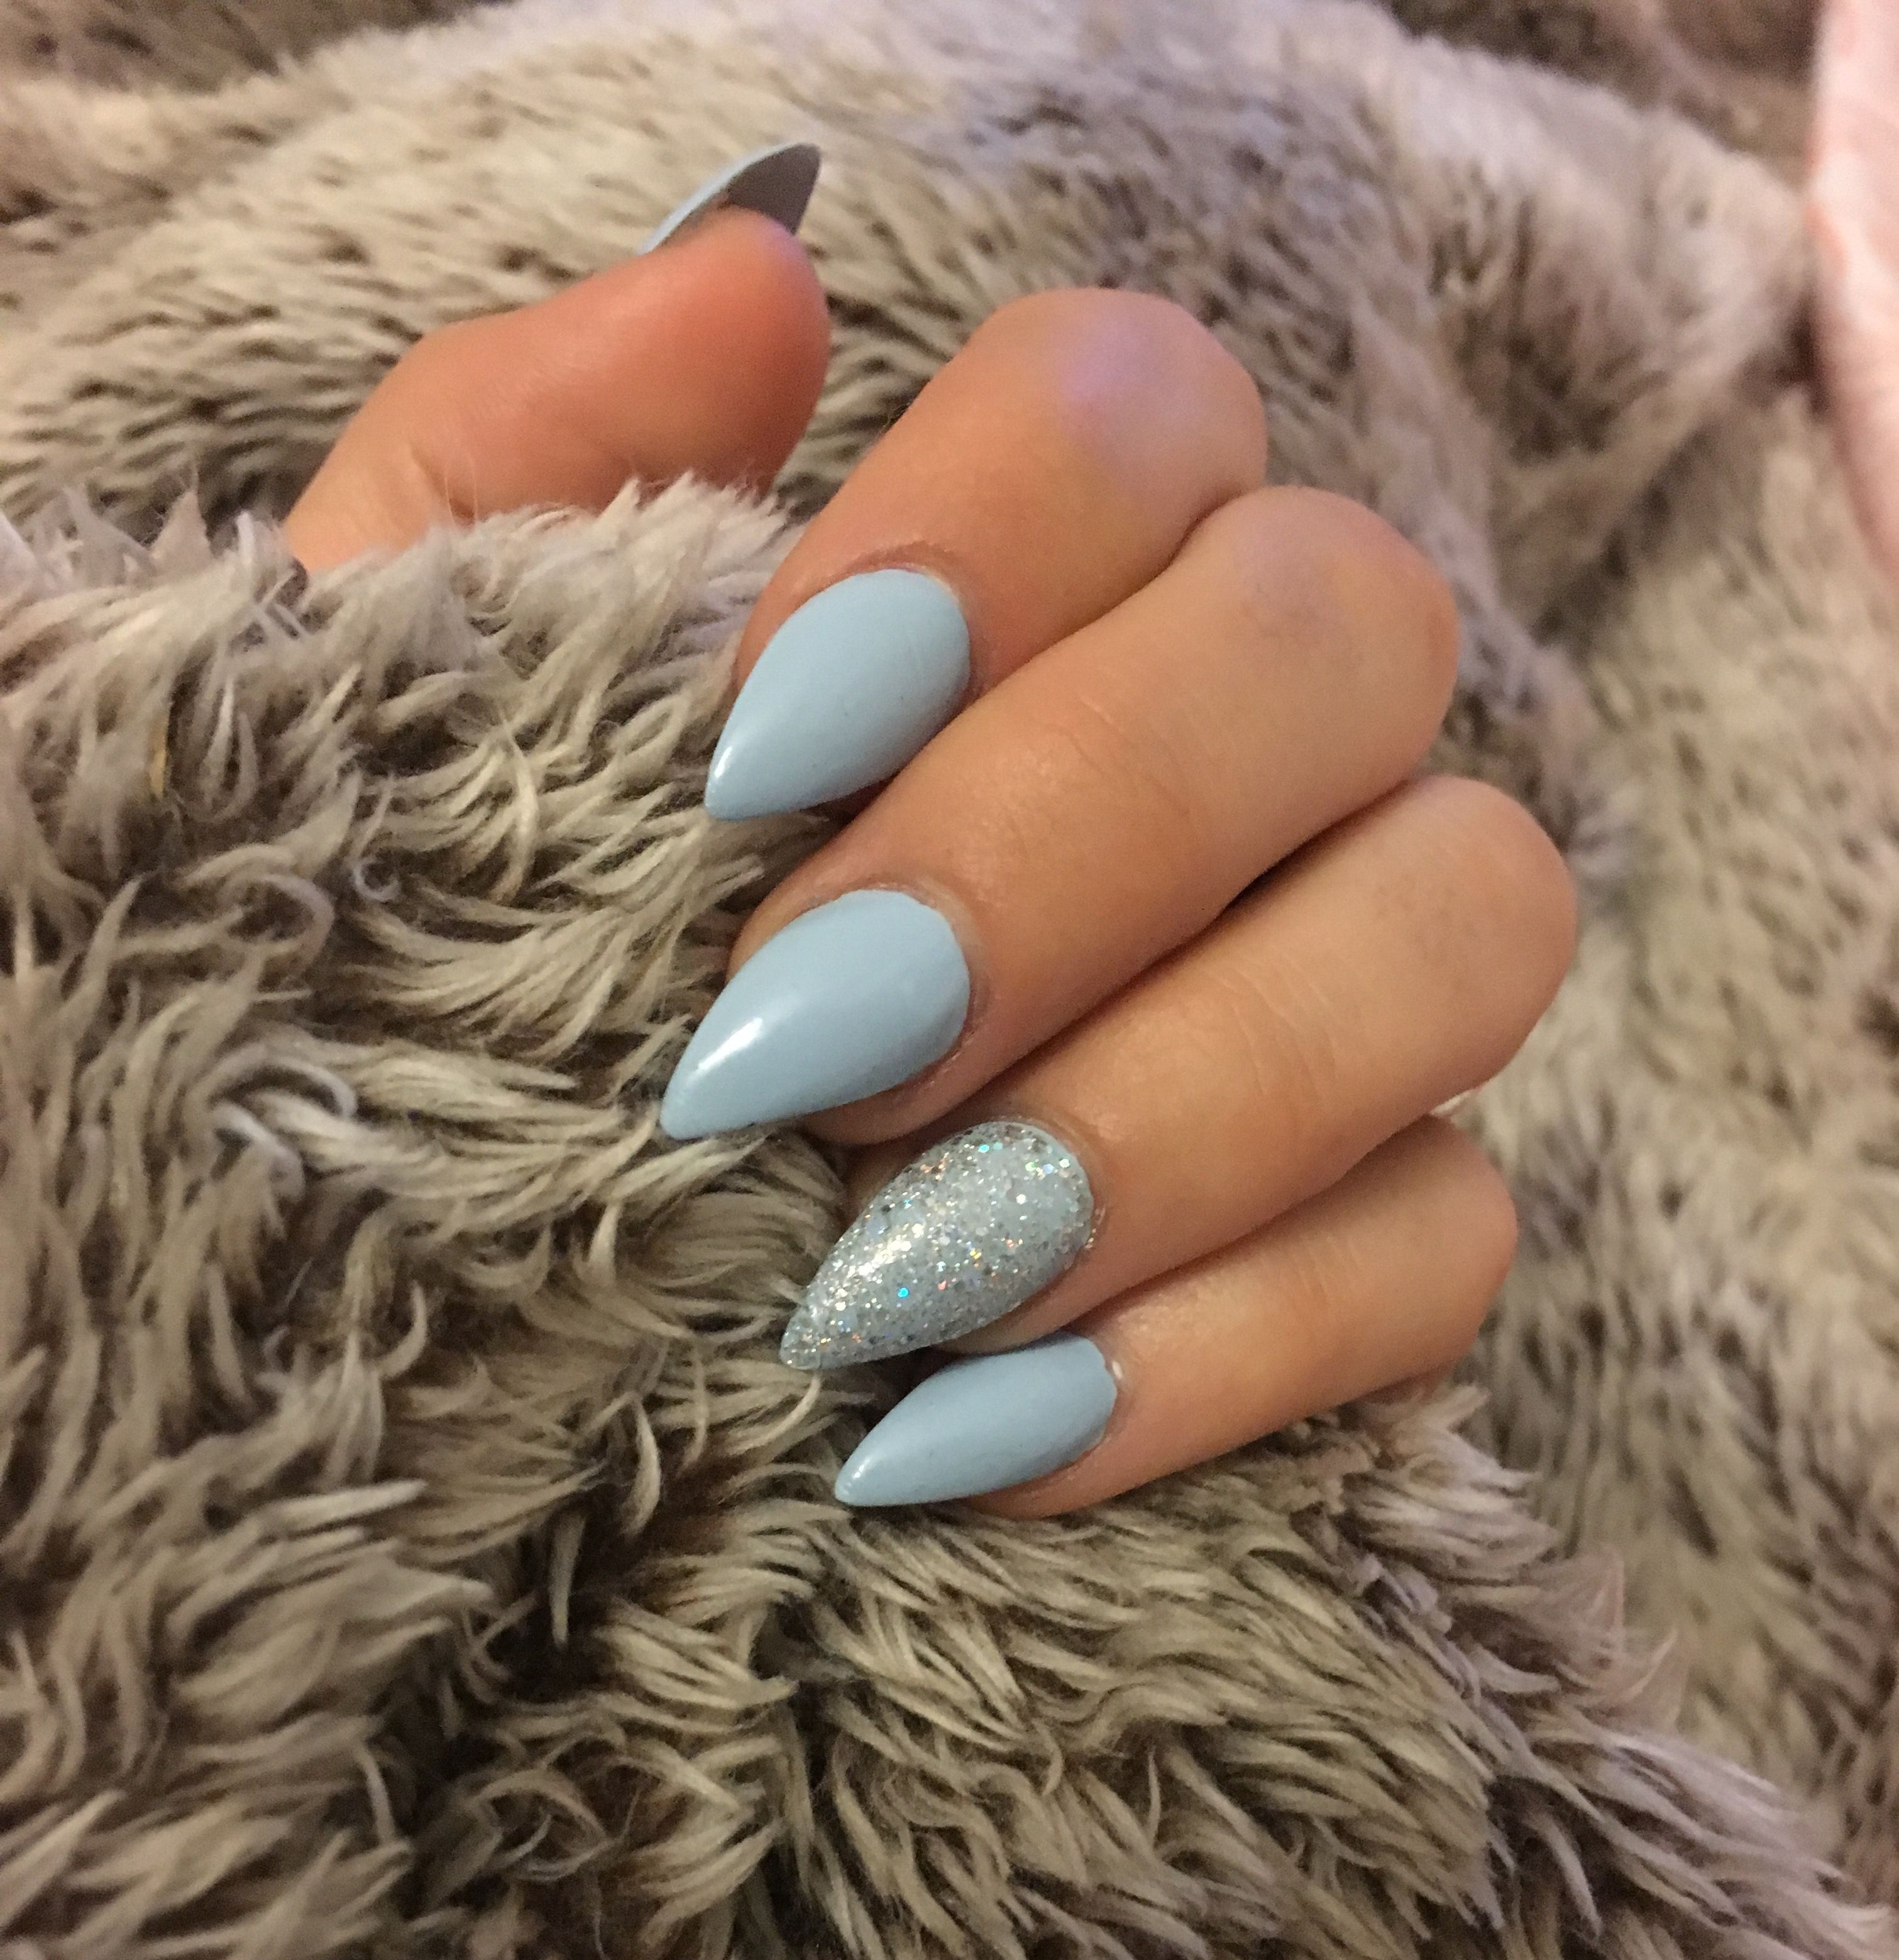 Cinderella Stiletto Acrylic Nails Quinceanera Nails Cinderella Nails Disney Acrylic Nails